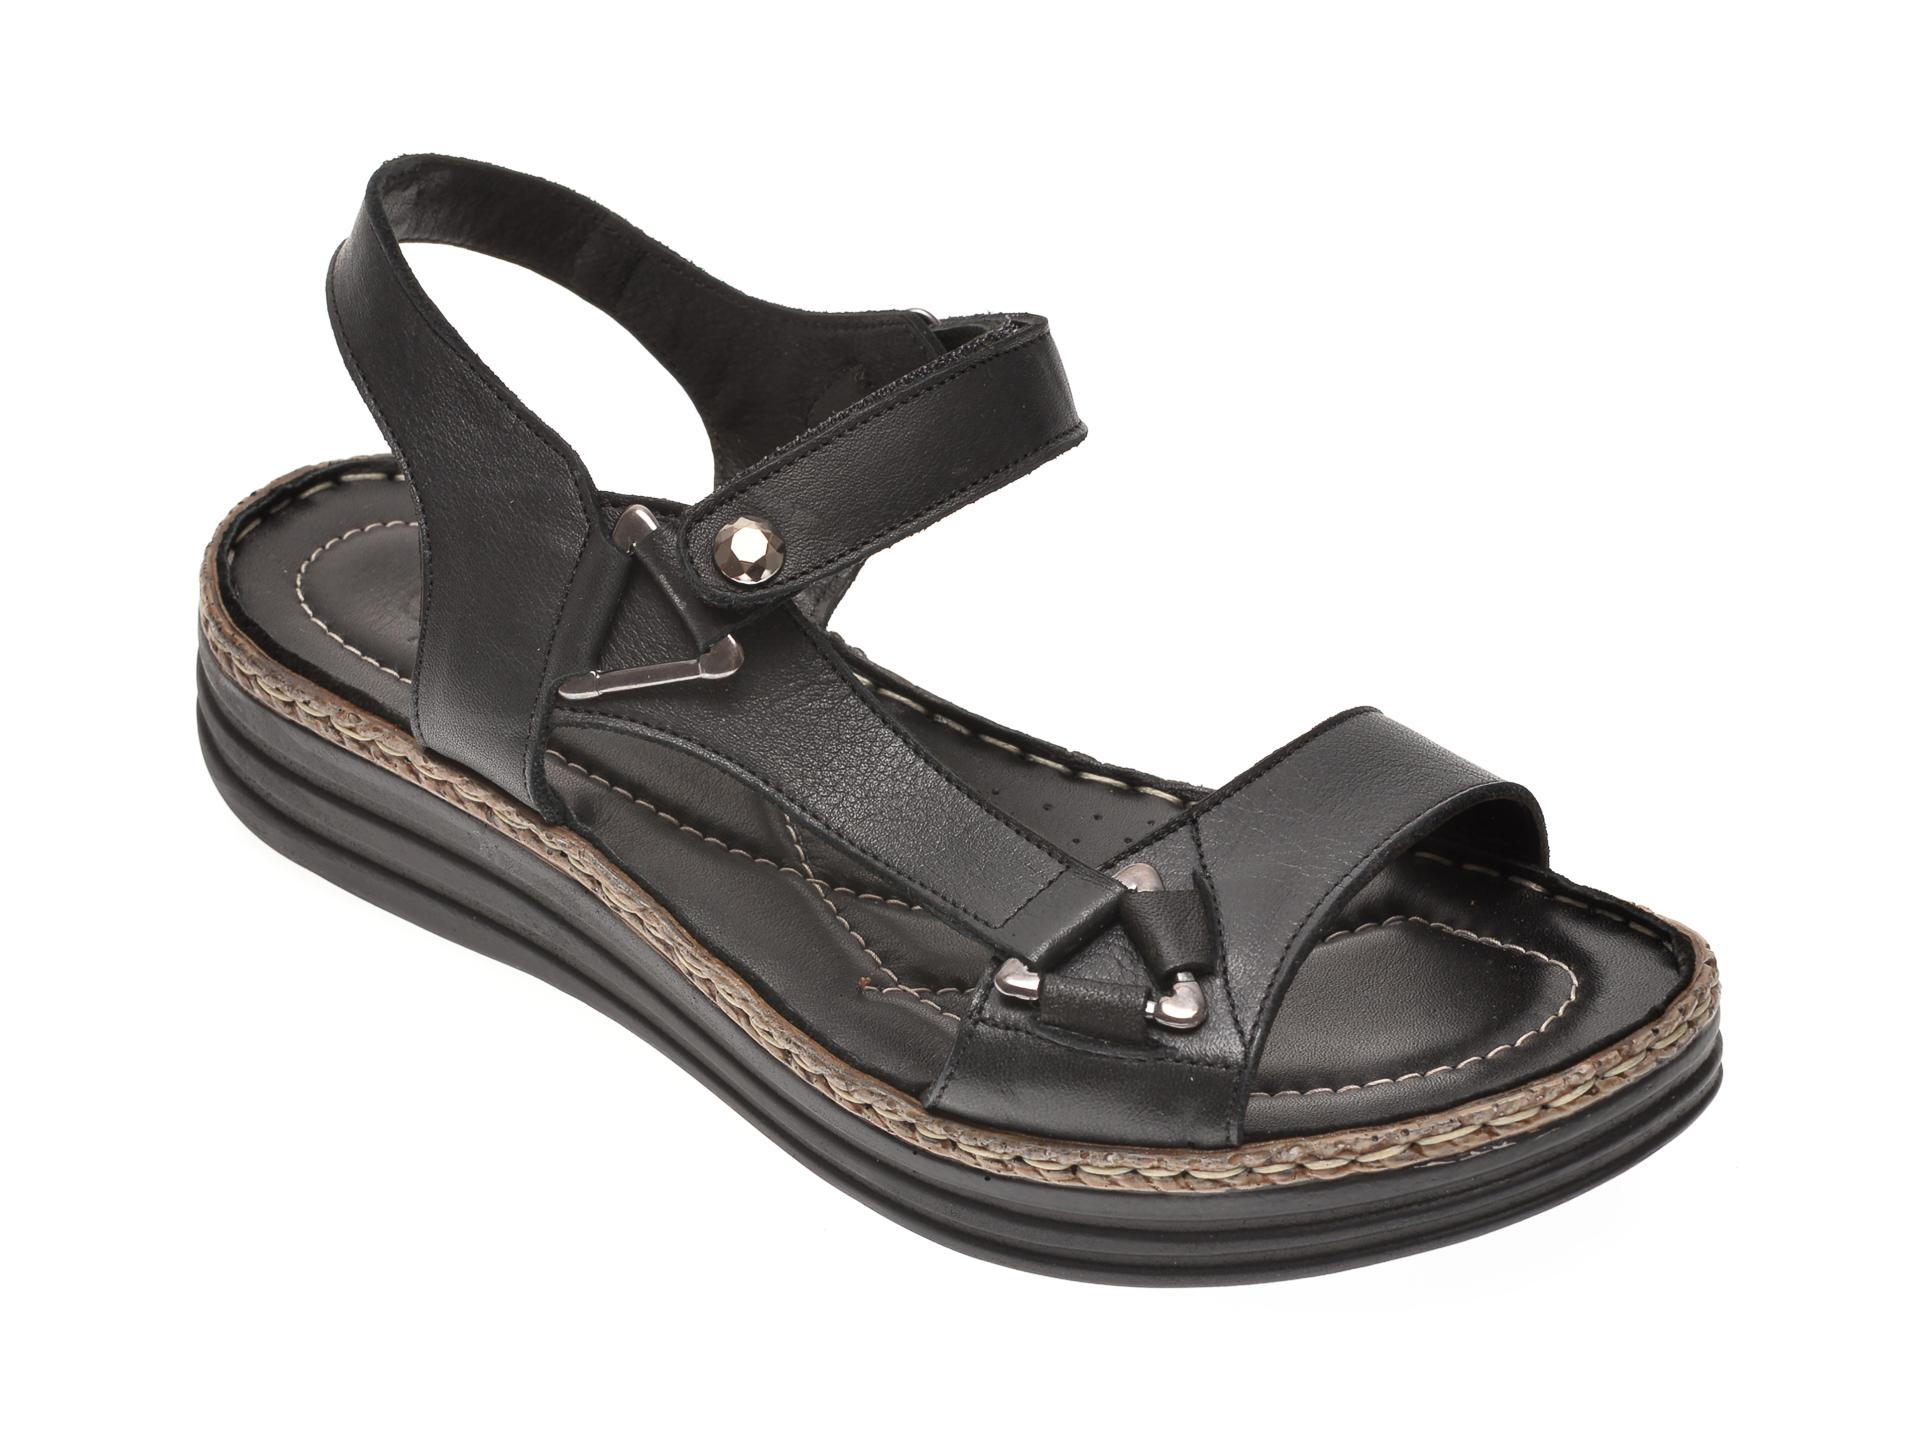 Sandale X TREND negre, 513, din piele naturala